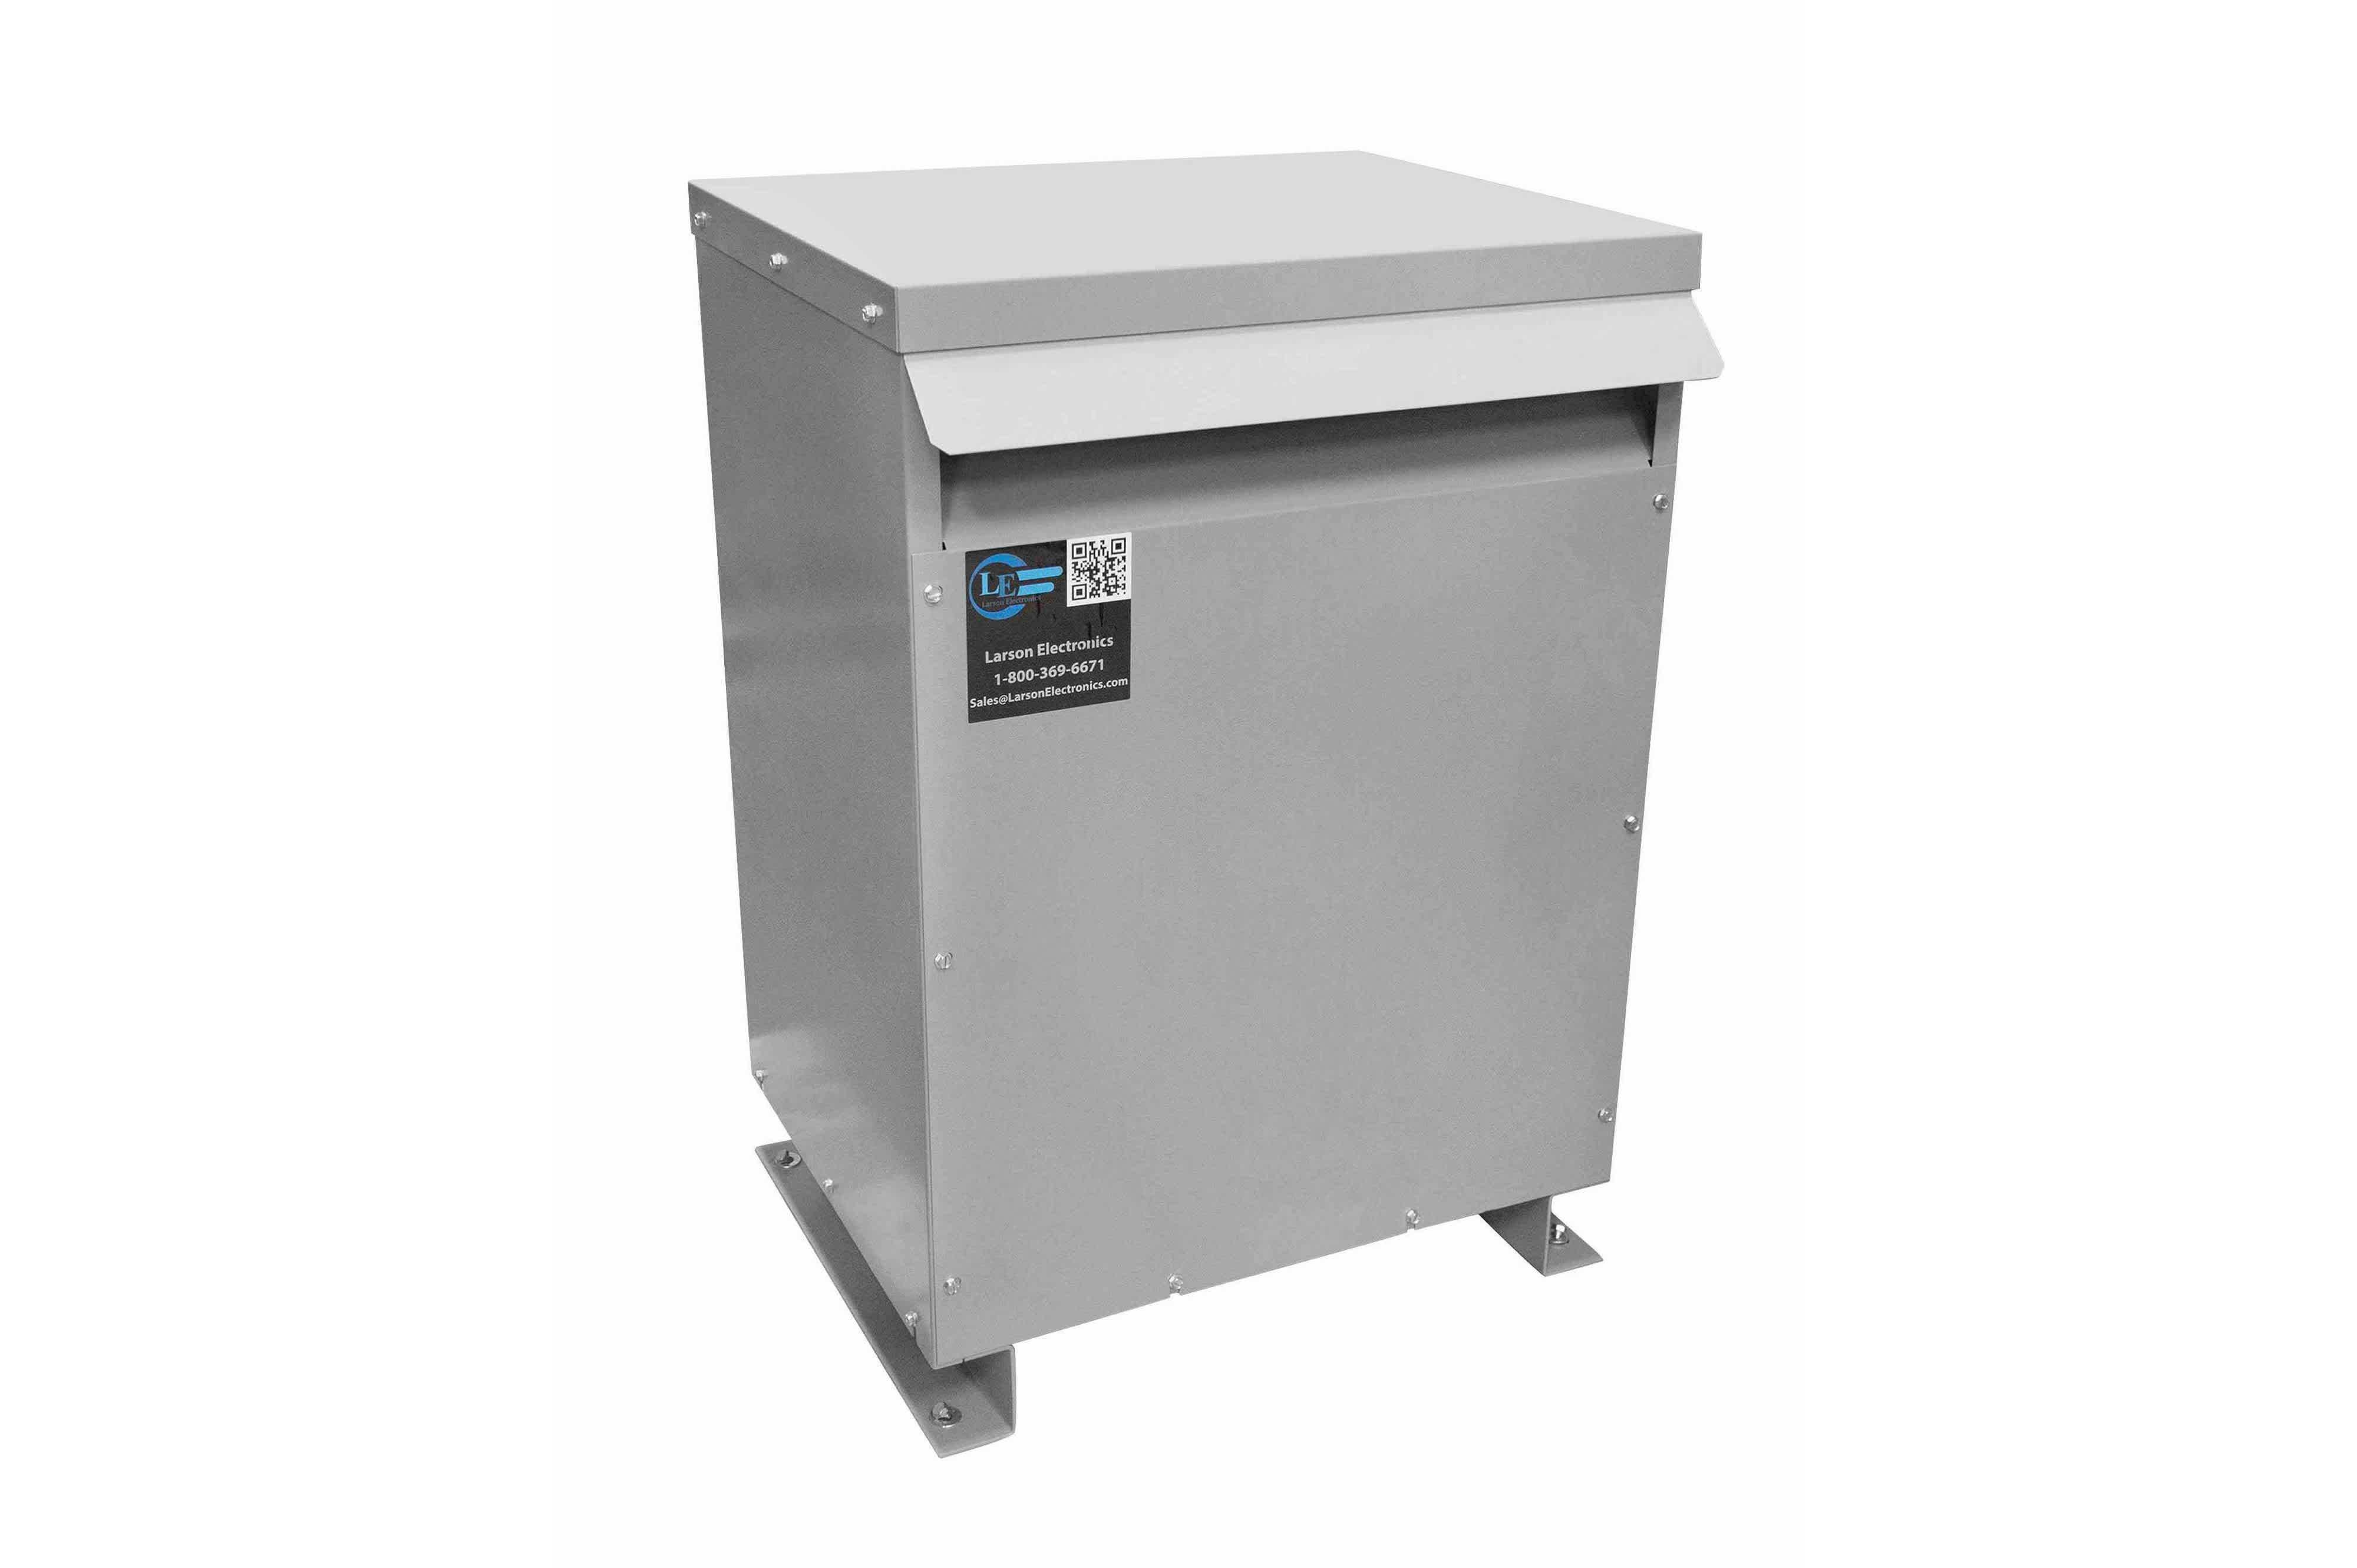 167 kVA 3PH DOE Transformer, 460V Delta Primary, 400Y/231 Wye-N Secondary, N3R, Ventilated, 60 Hz